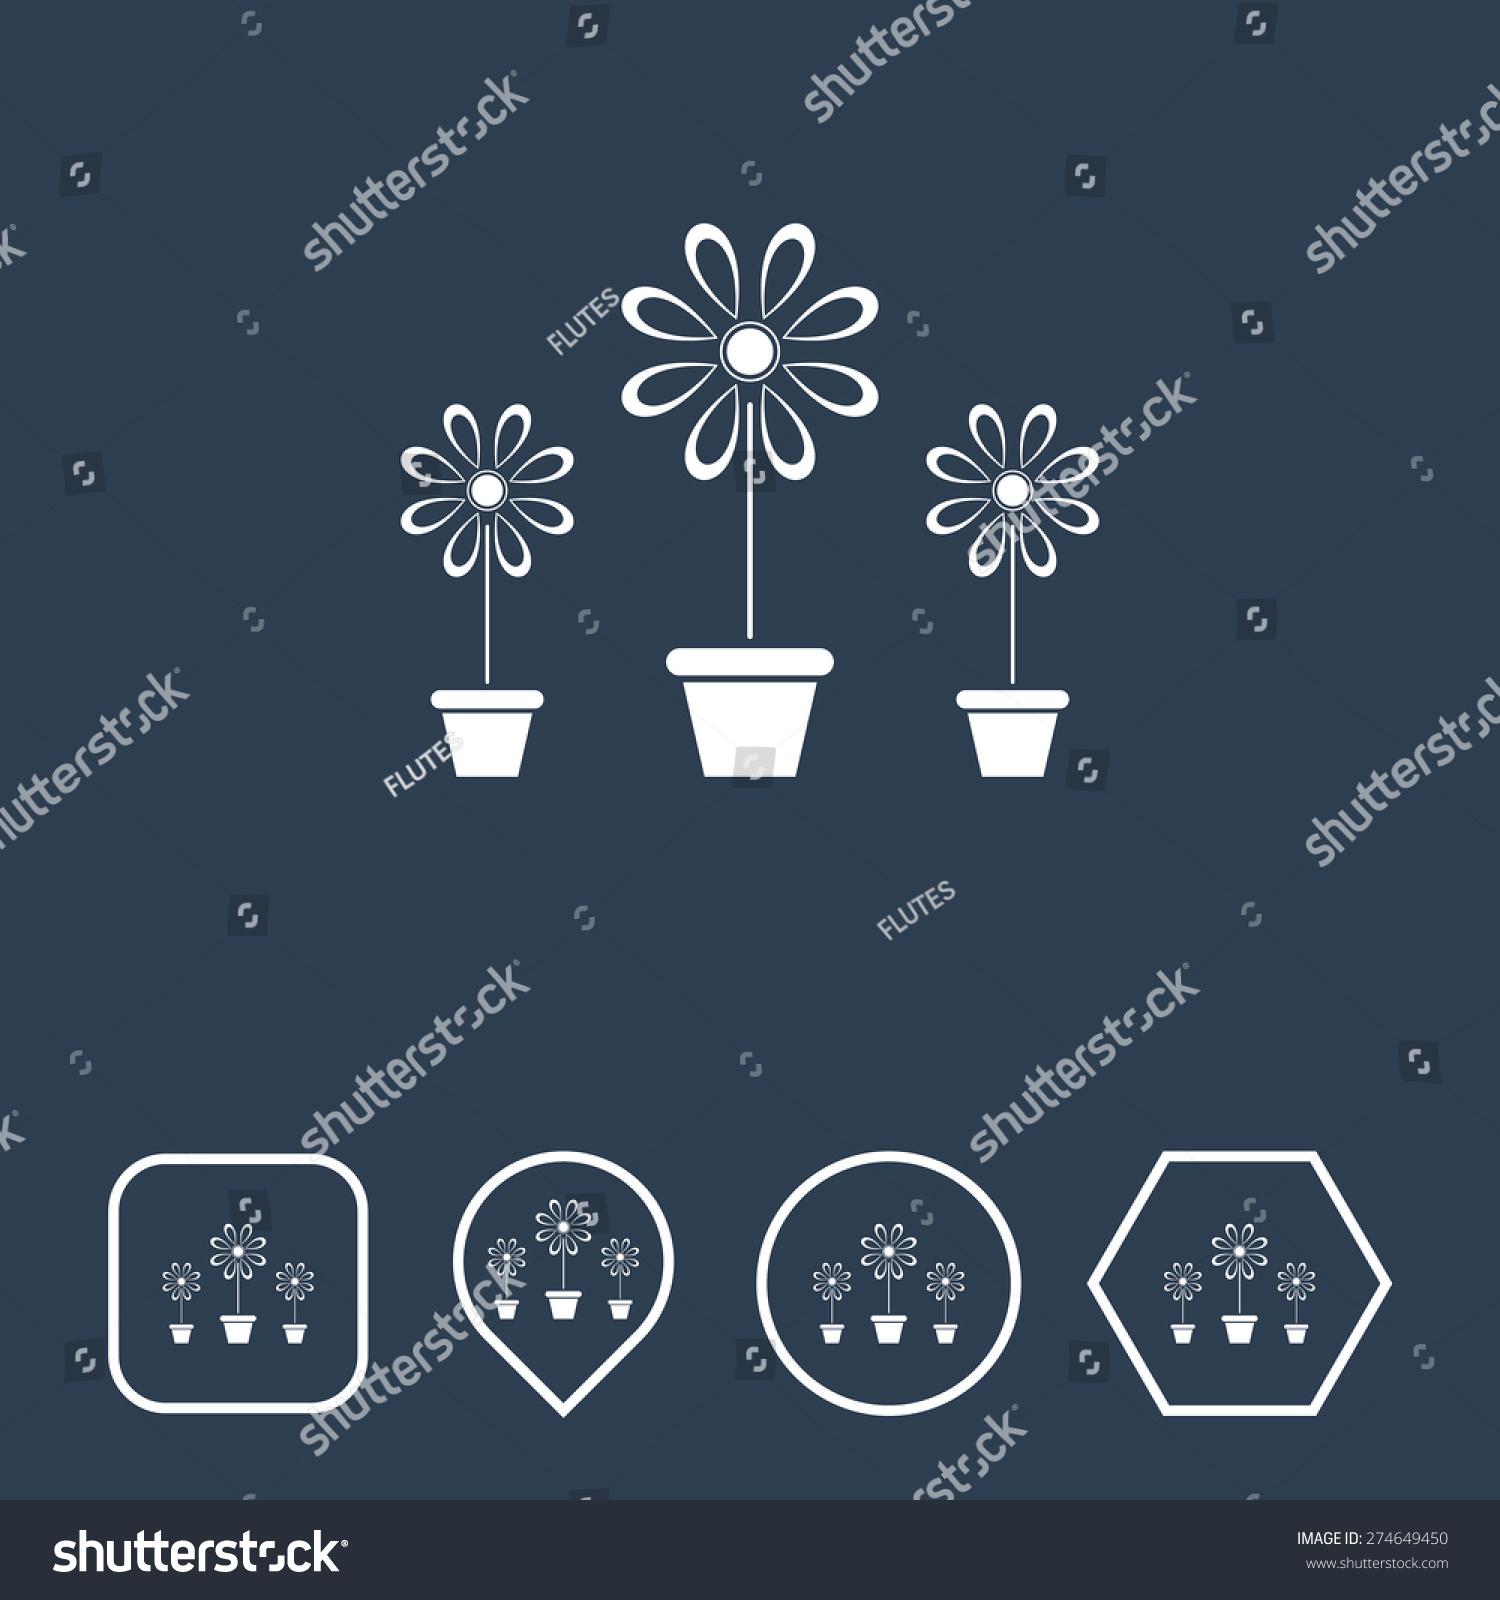 Flower vase icon on flat ui stock vector 274649450 shutterstock flower vase icon on flat ui colors with different shapes eps 10 reviewsmspy